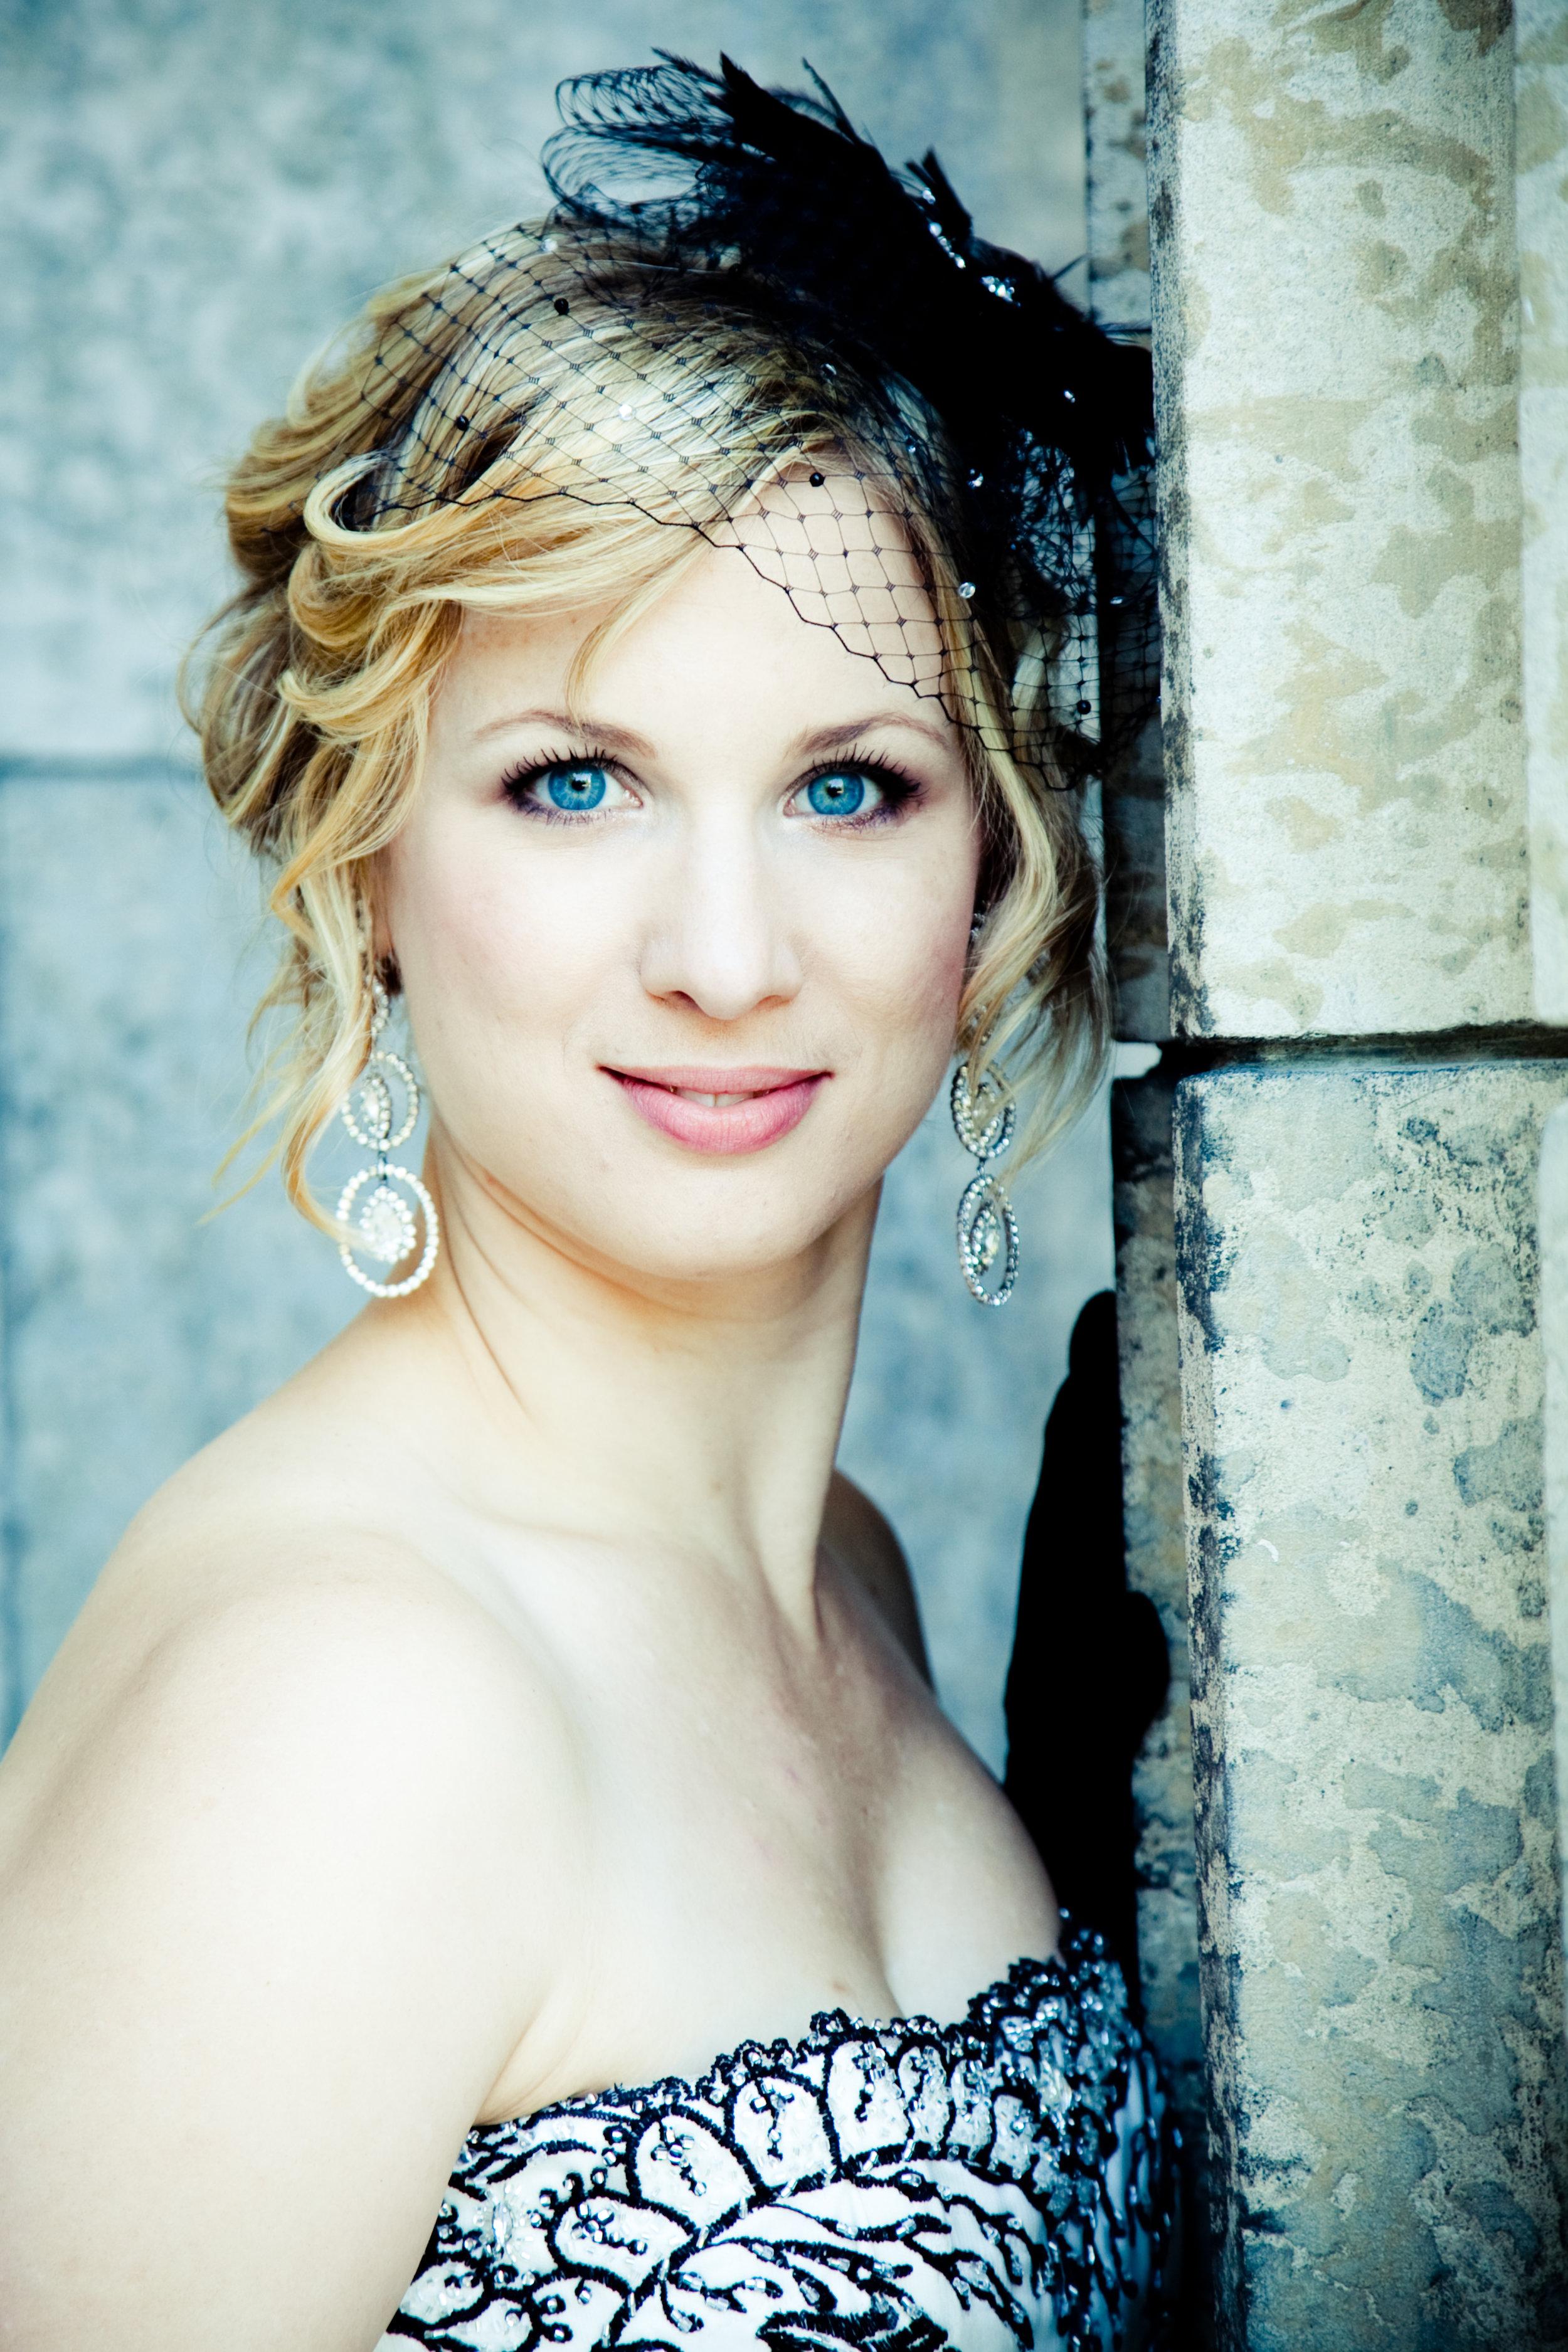 Lara Ciekiewicz Headshot - Winnipeg.jpg